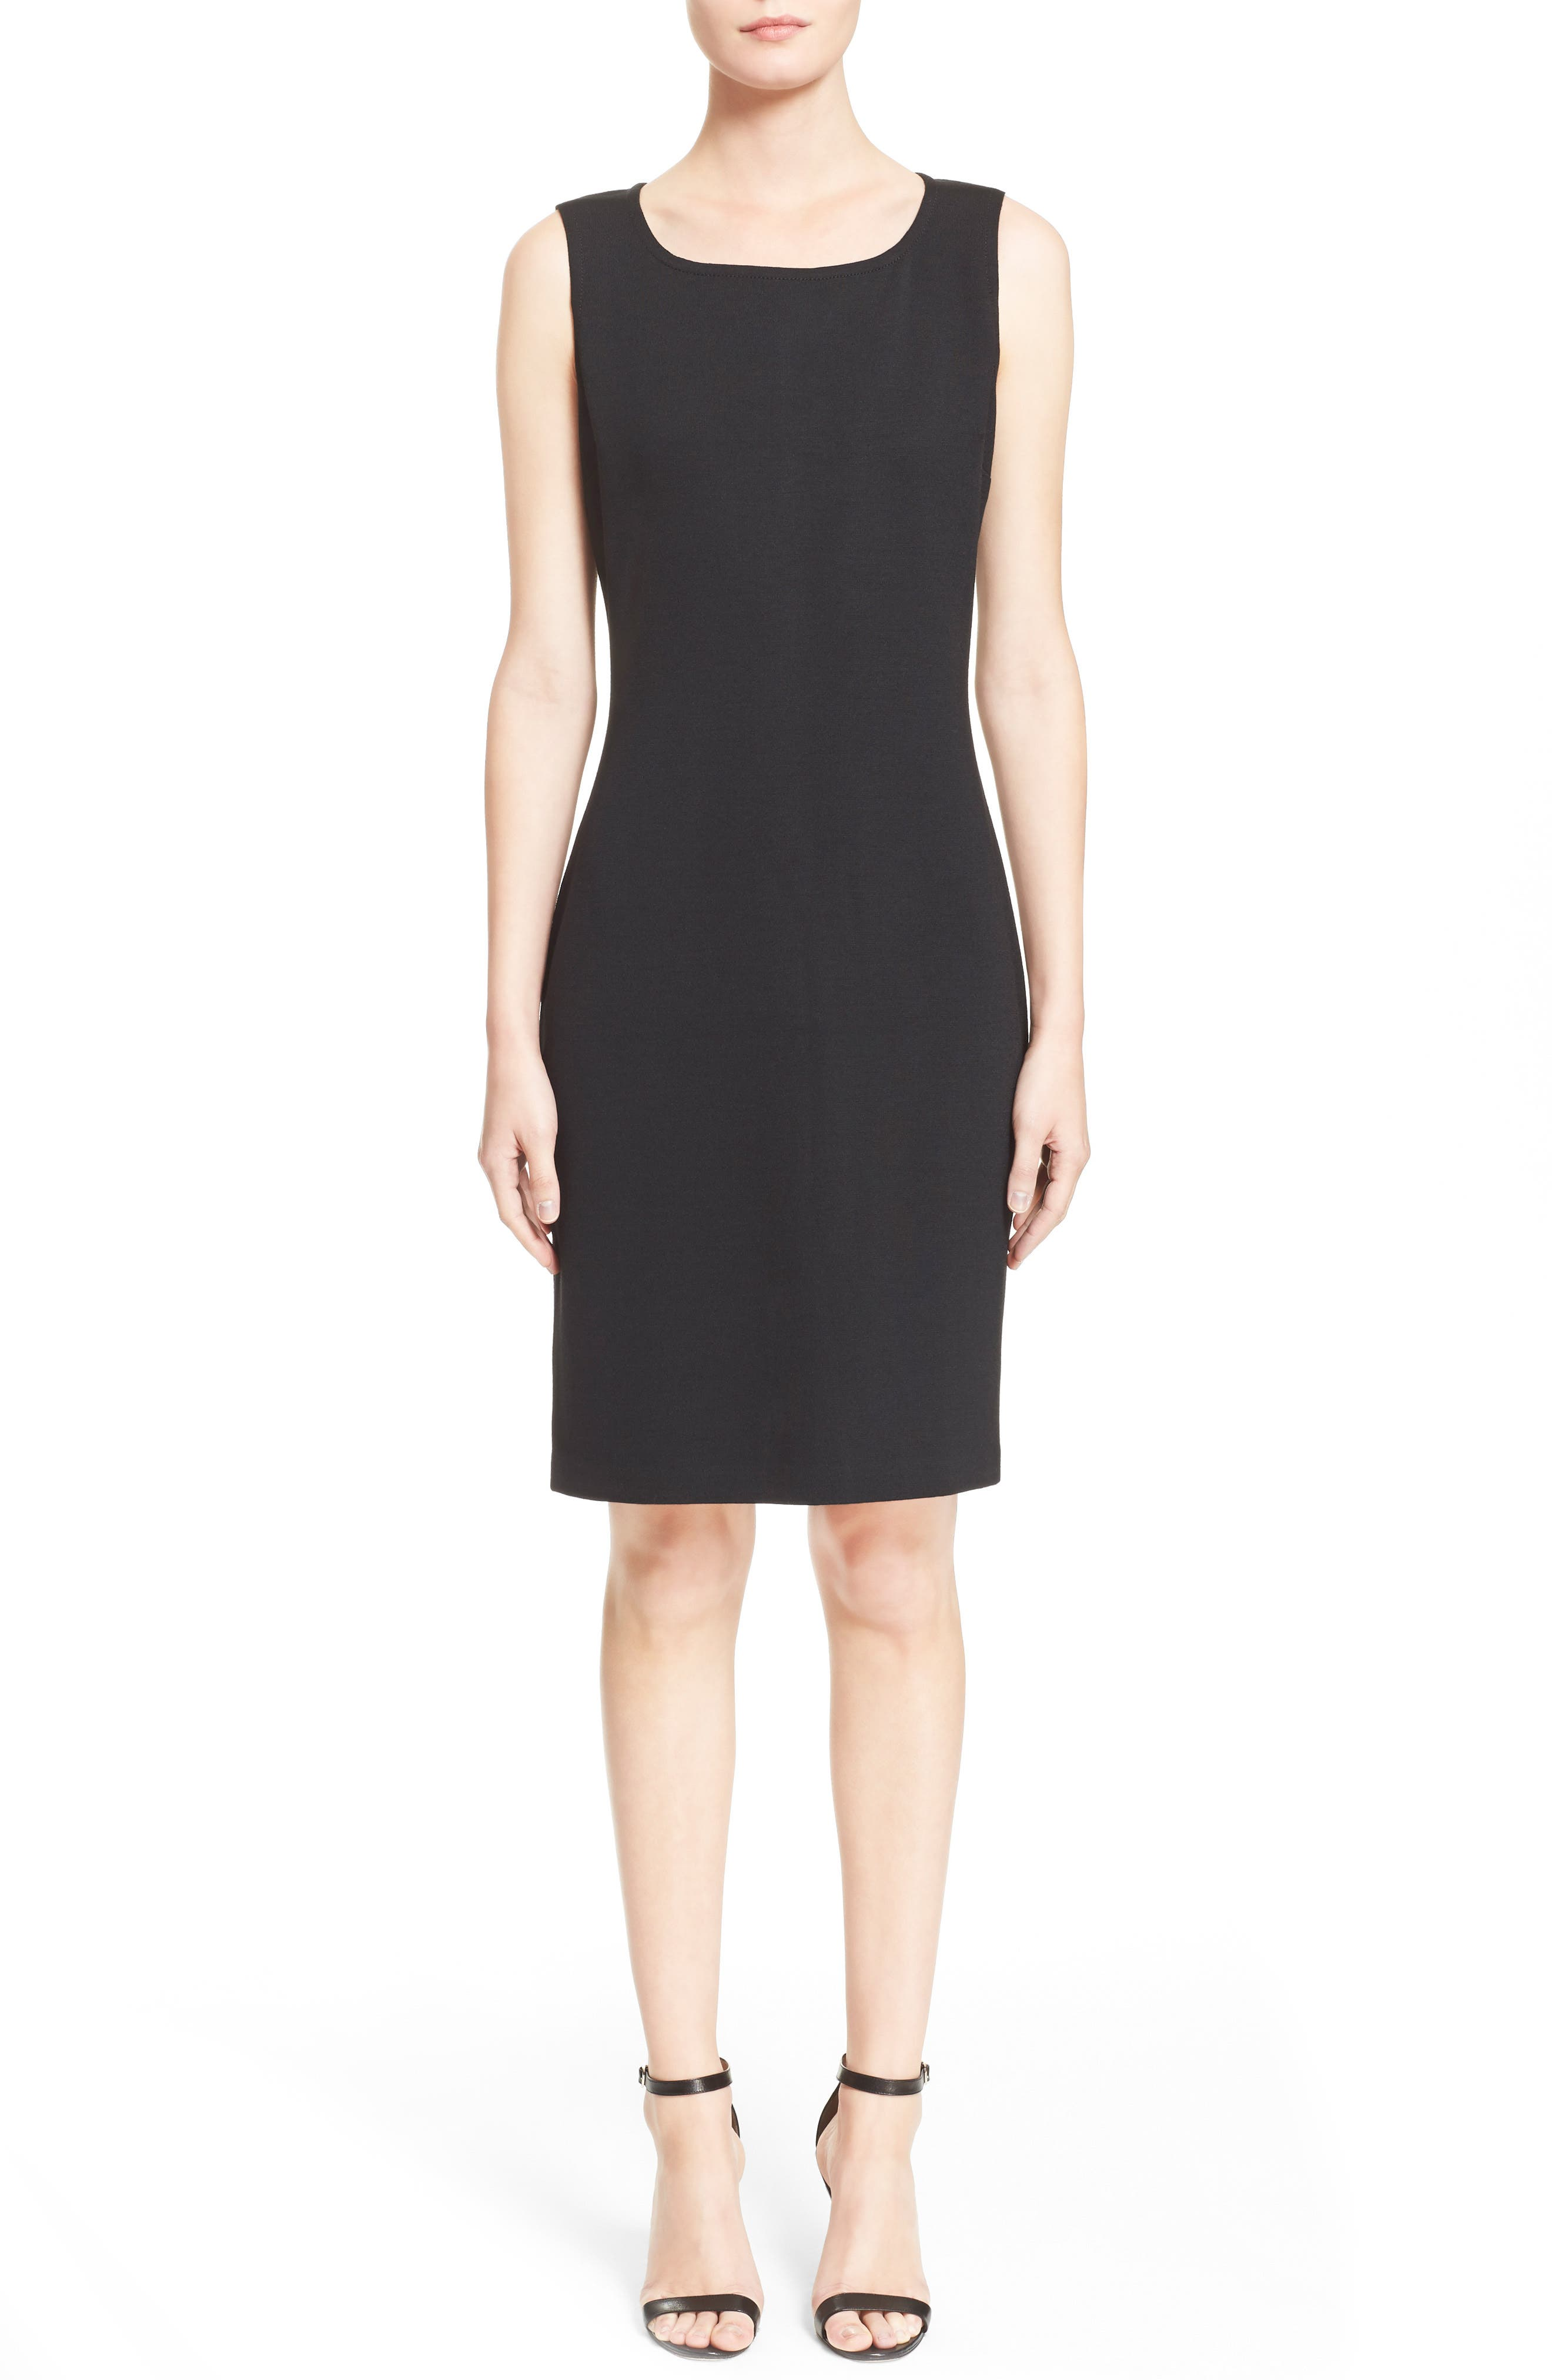 ST. JOHN COLLECTION, Milano Knit Sheath Dress, Main thumbnail 1, color, CAVIAR